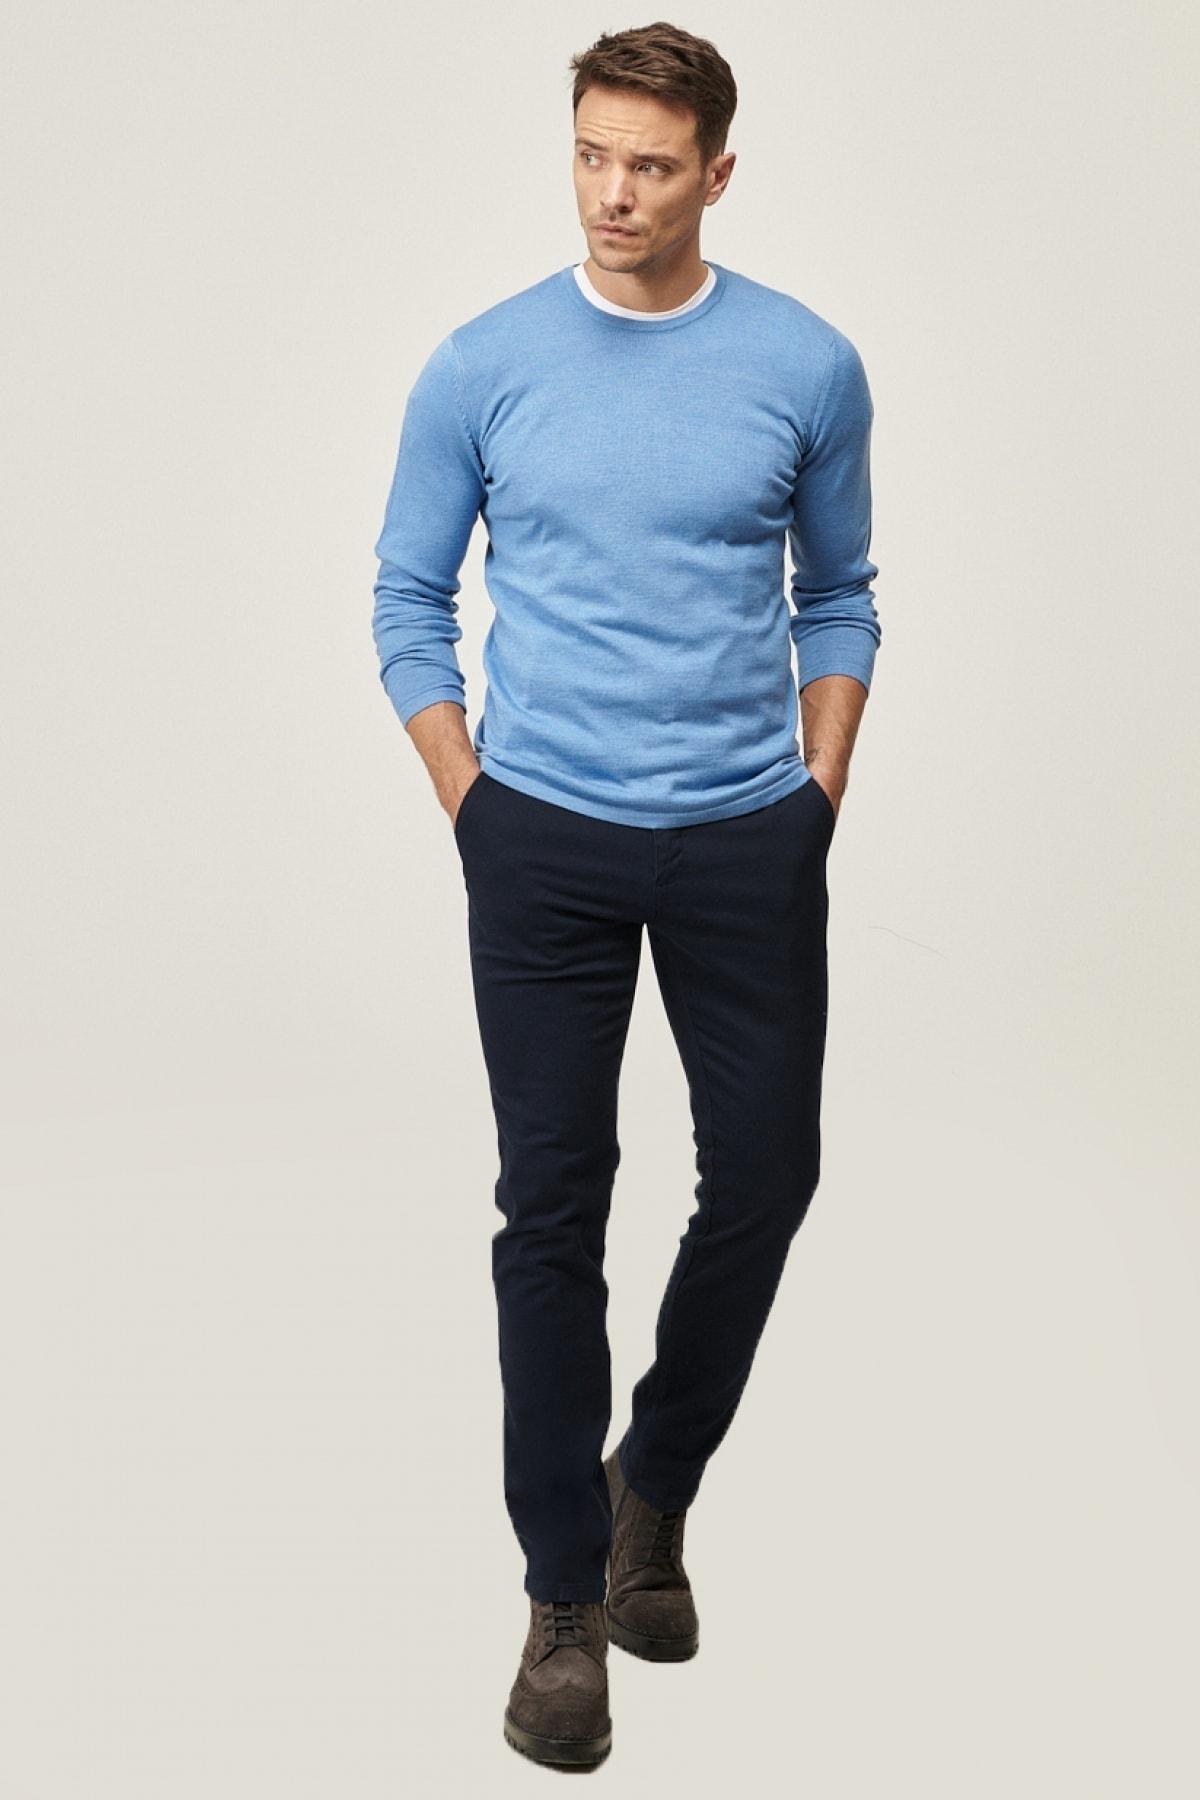 AC&Co / Altınyıldız Classics Erkek Lacivert Kanvas Slim Fit Dar Kesim Yan Cep Chino Pantolon 1